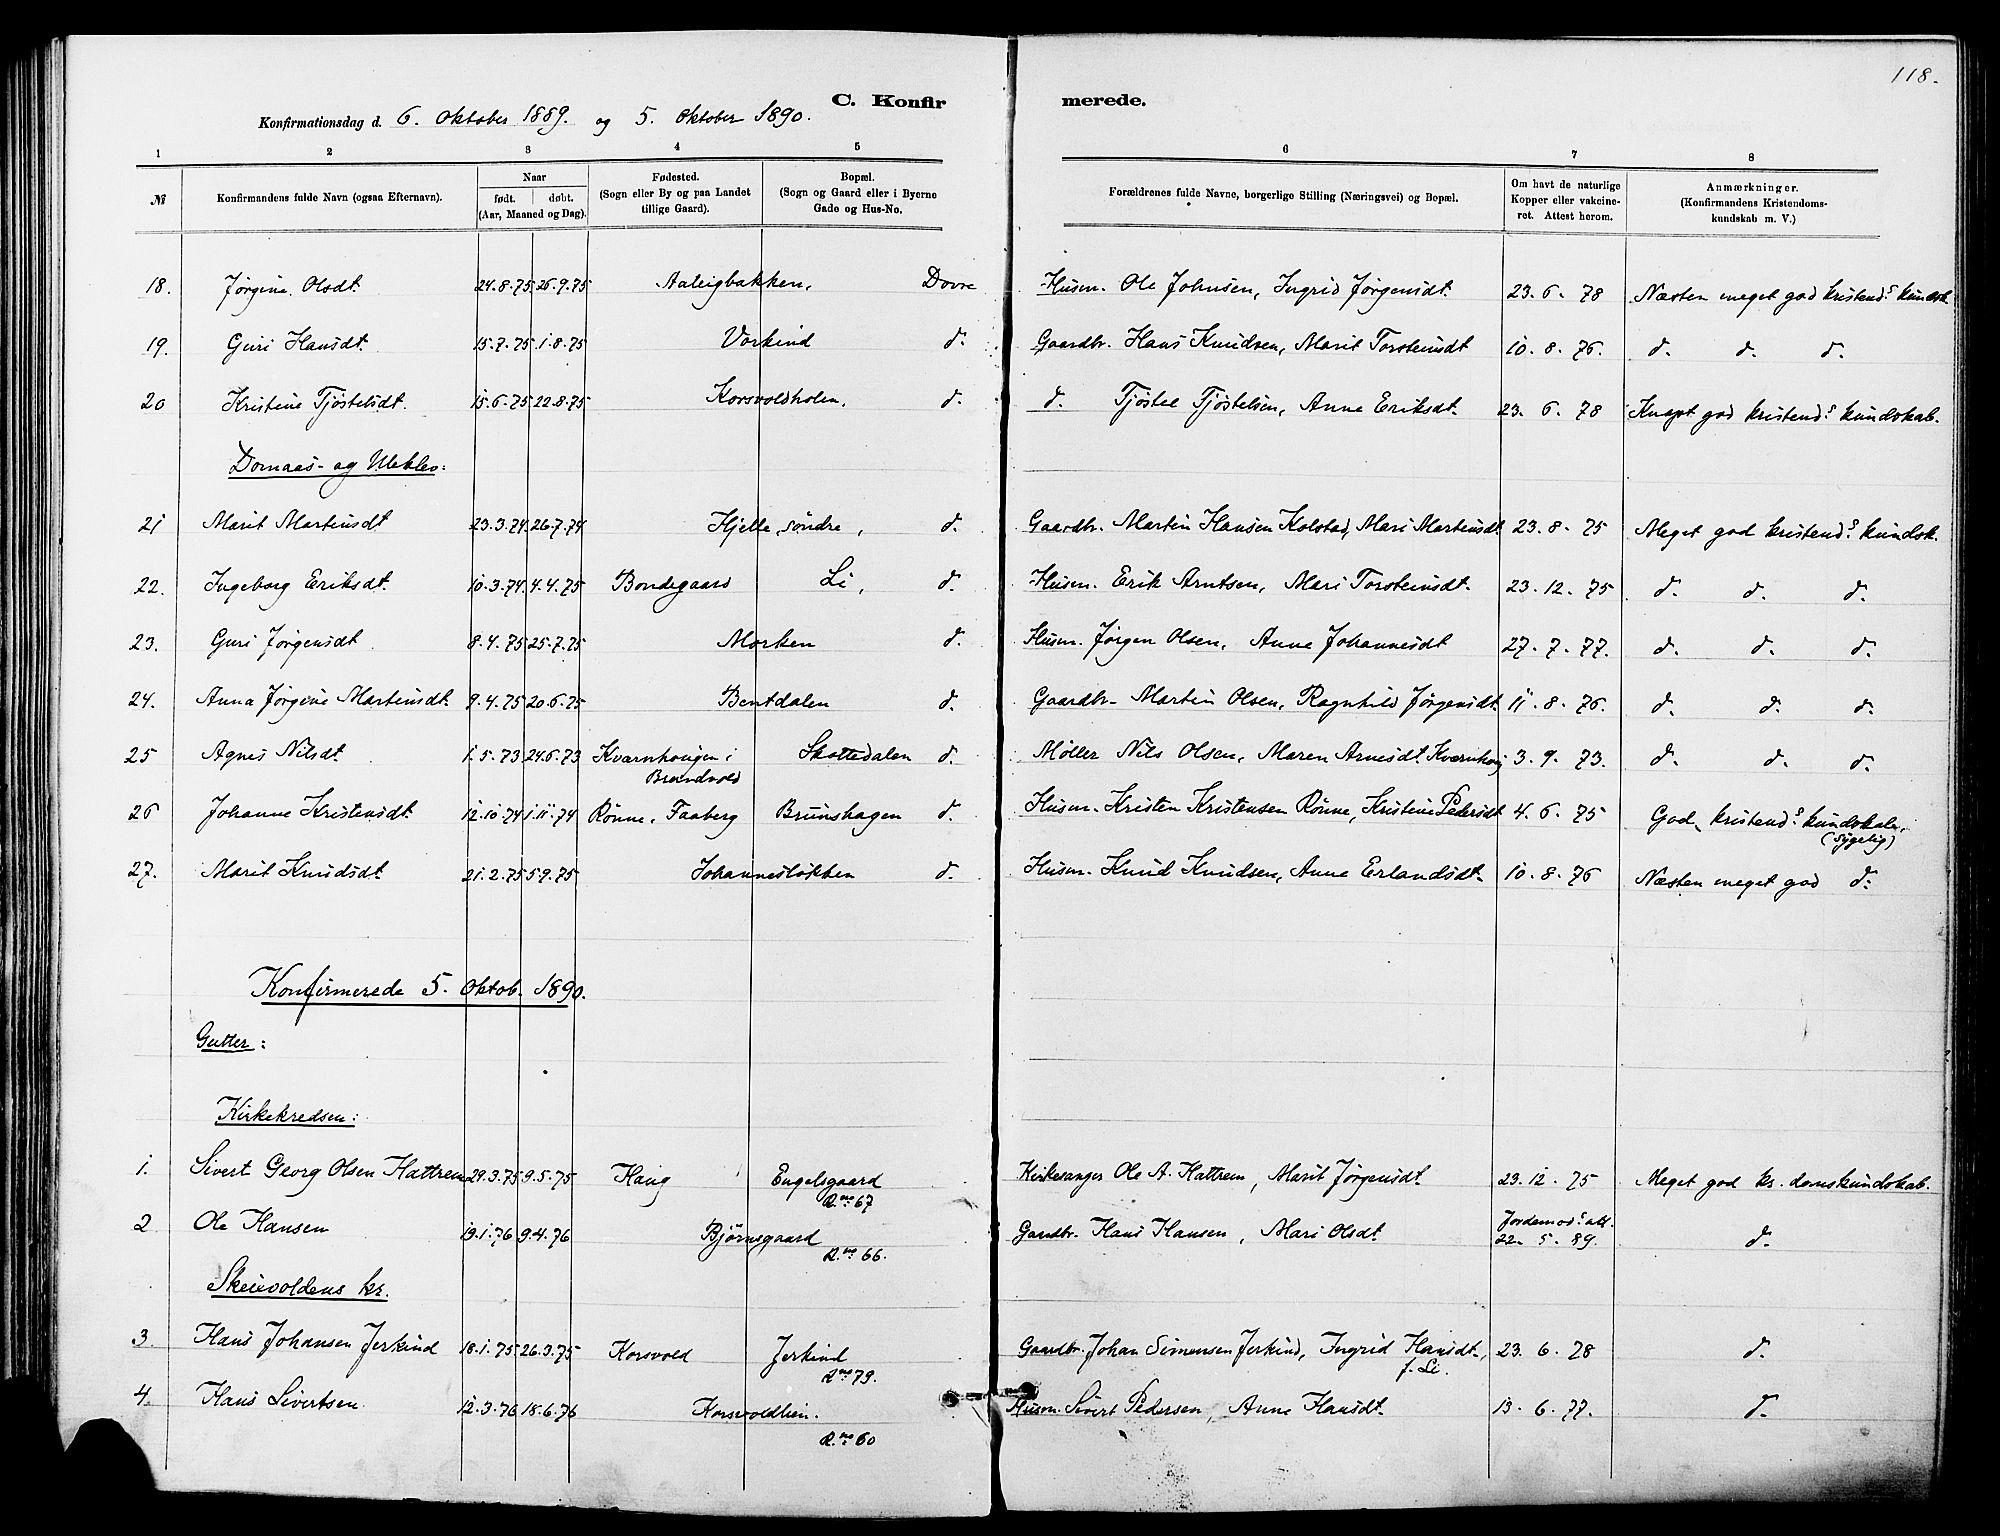 SAH, Dovre prestekontor, Ministerialbok nr. 2, 1879-1890, s. 118